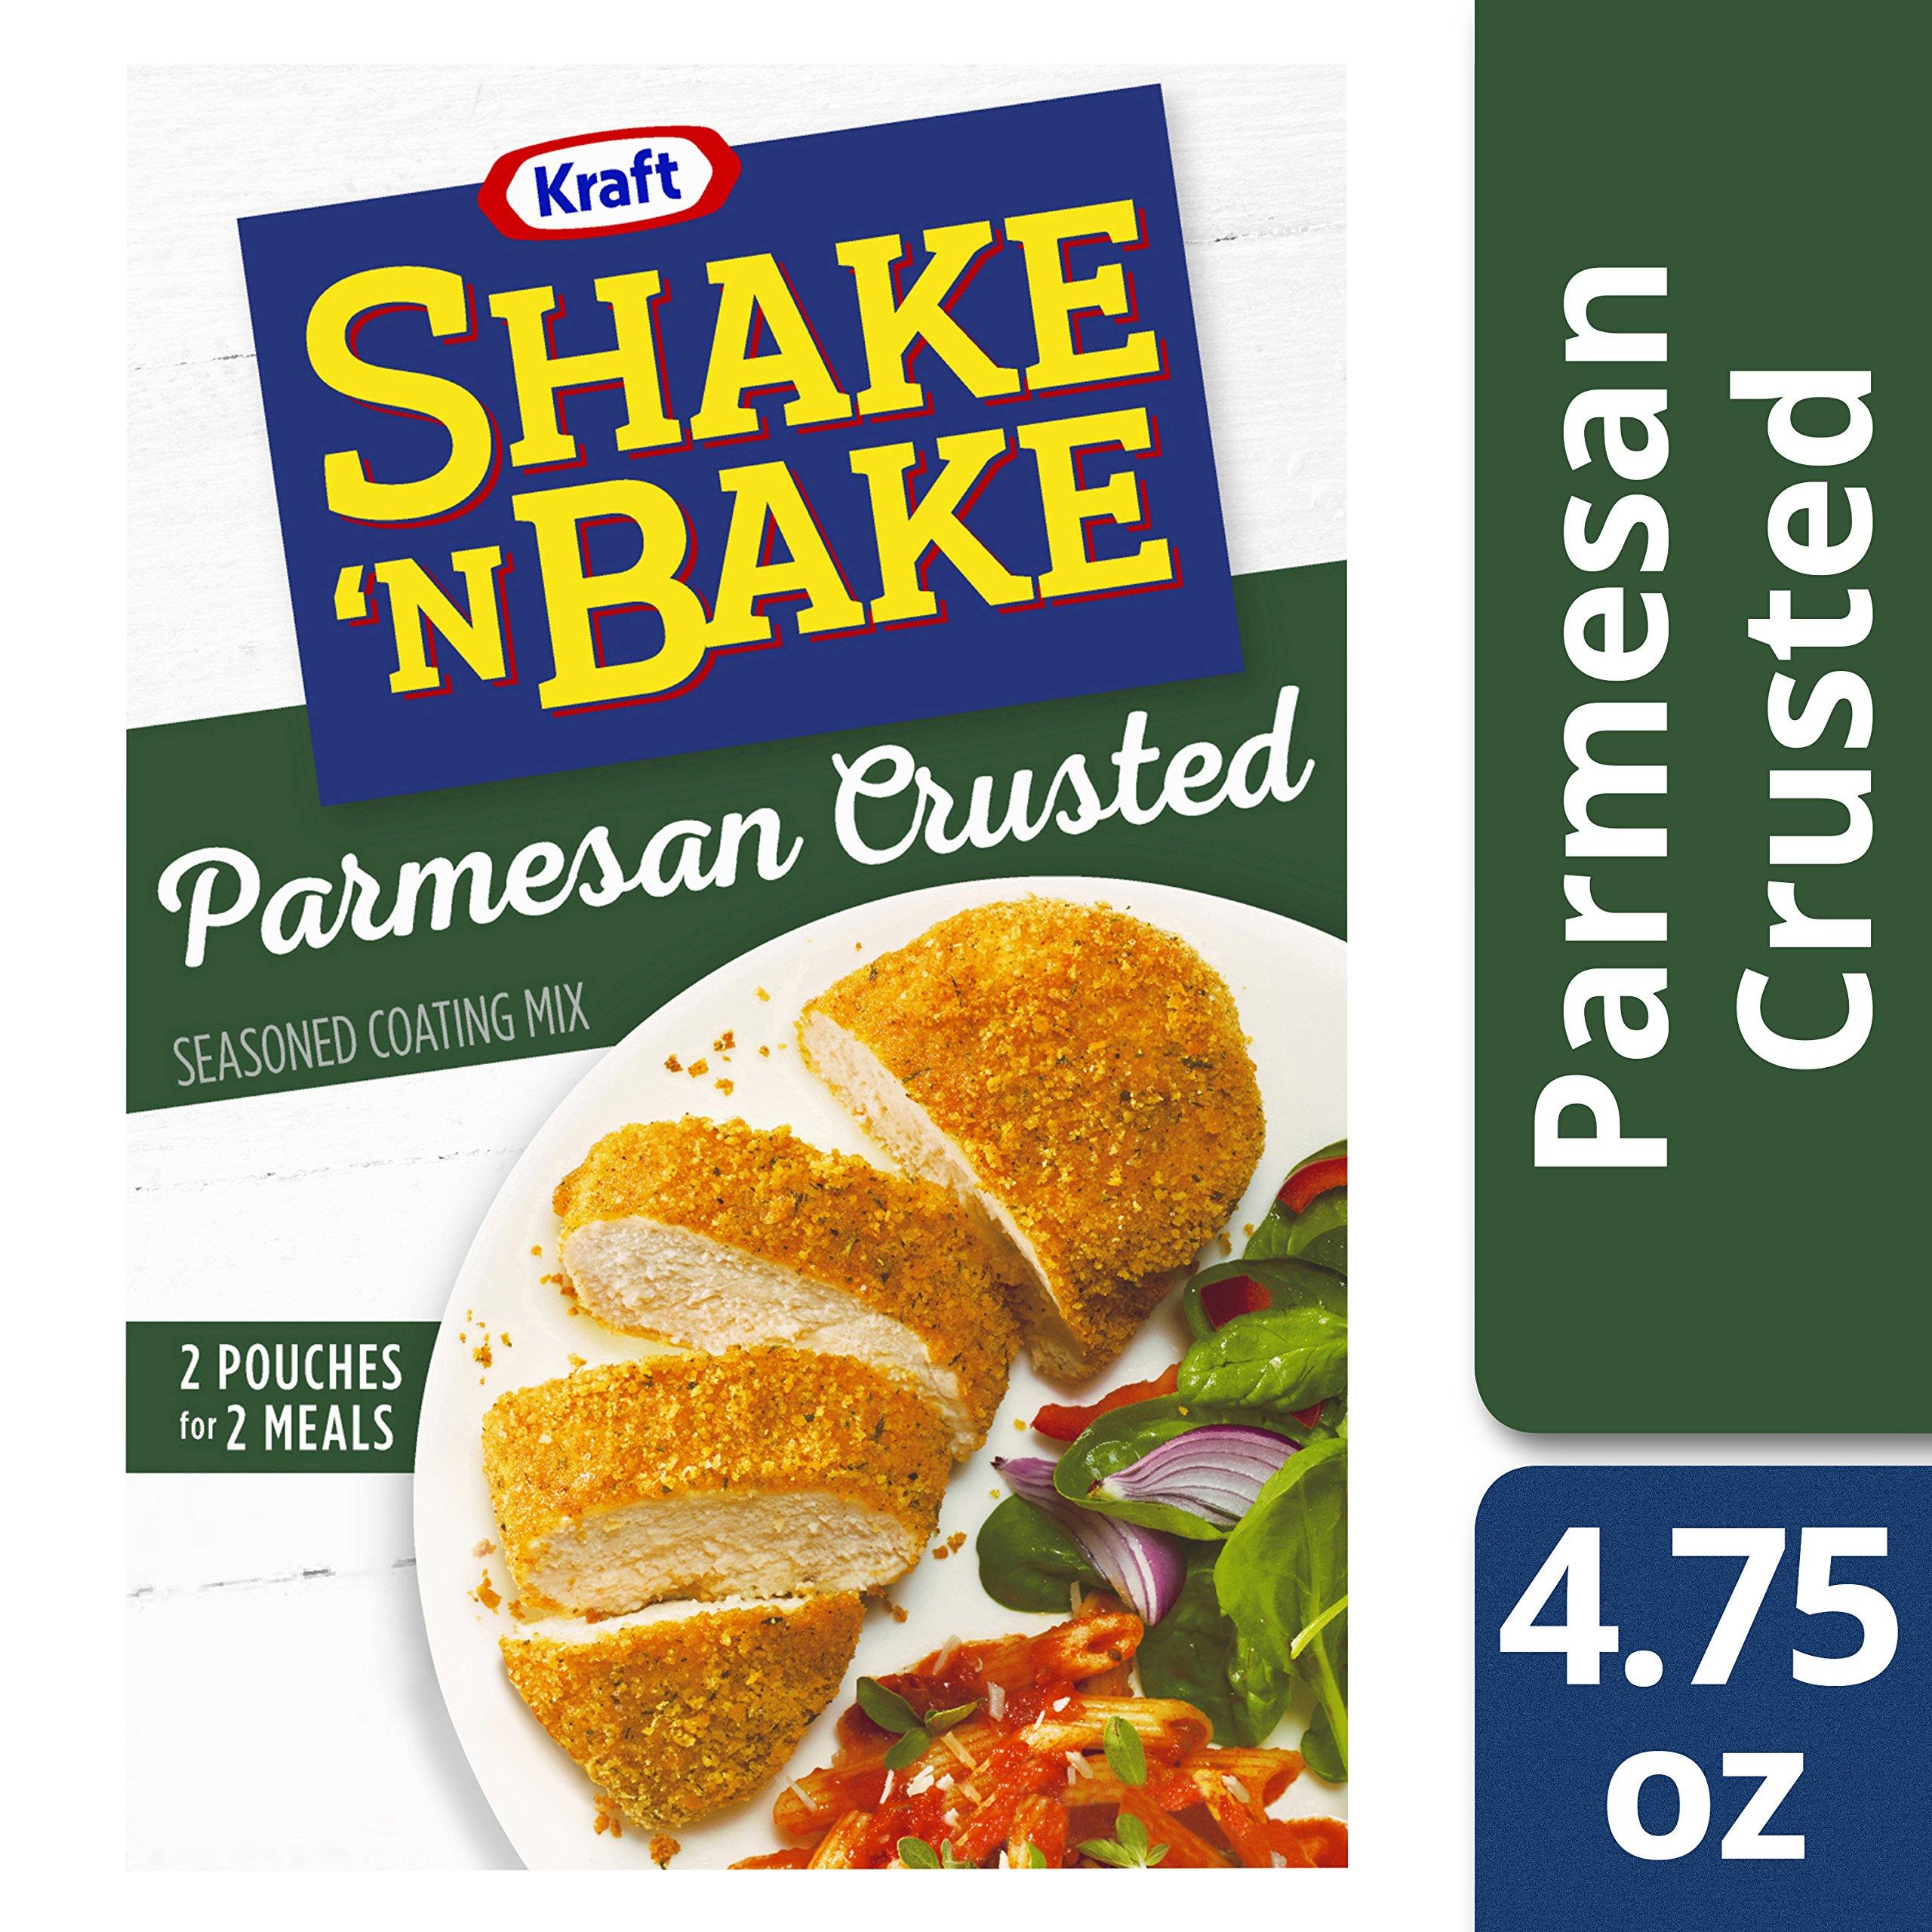 Kraft Shake N Bake Seasoned Coating Mix Box, Parmesan Crusted, 4.75 Ounce (Pack of 8)